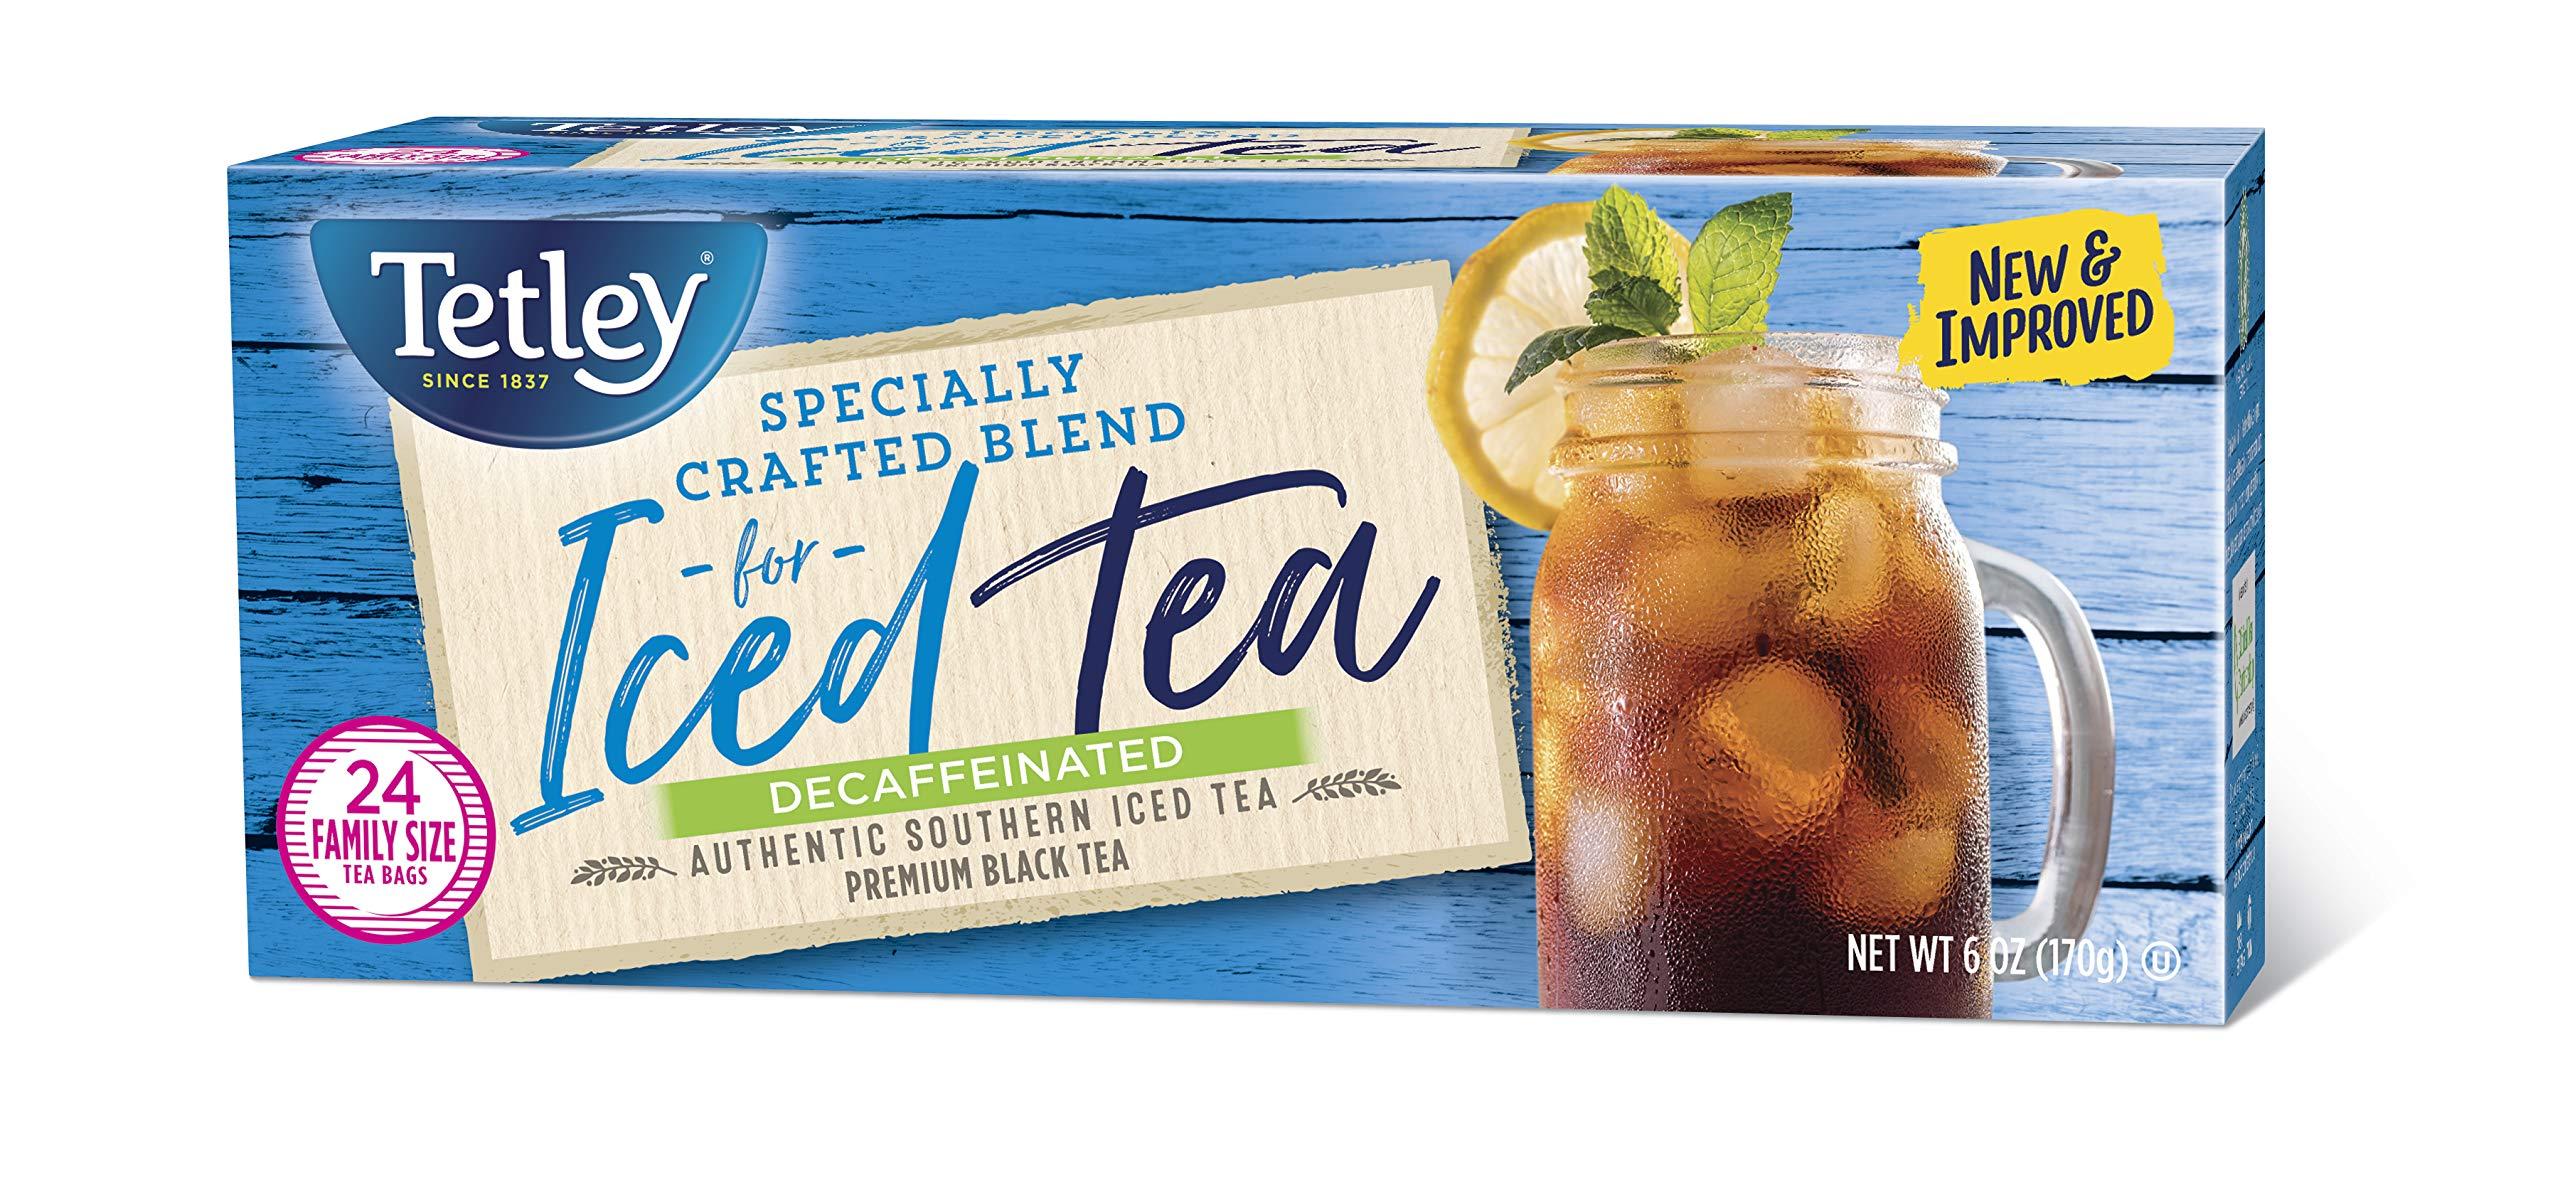 Tetley Black Tea, Decaffeinated Iced Tea Blend, Family Size, 24 Round Tea Bags (Pack of 6) by Tetley